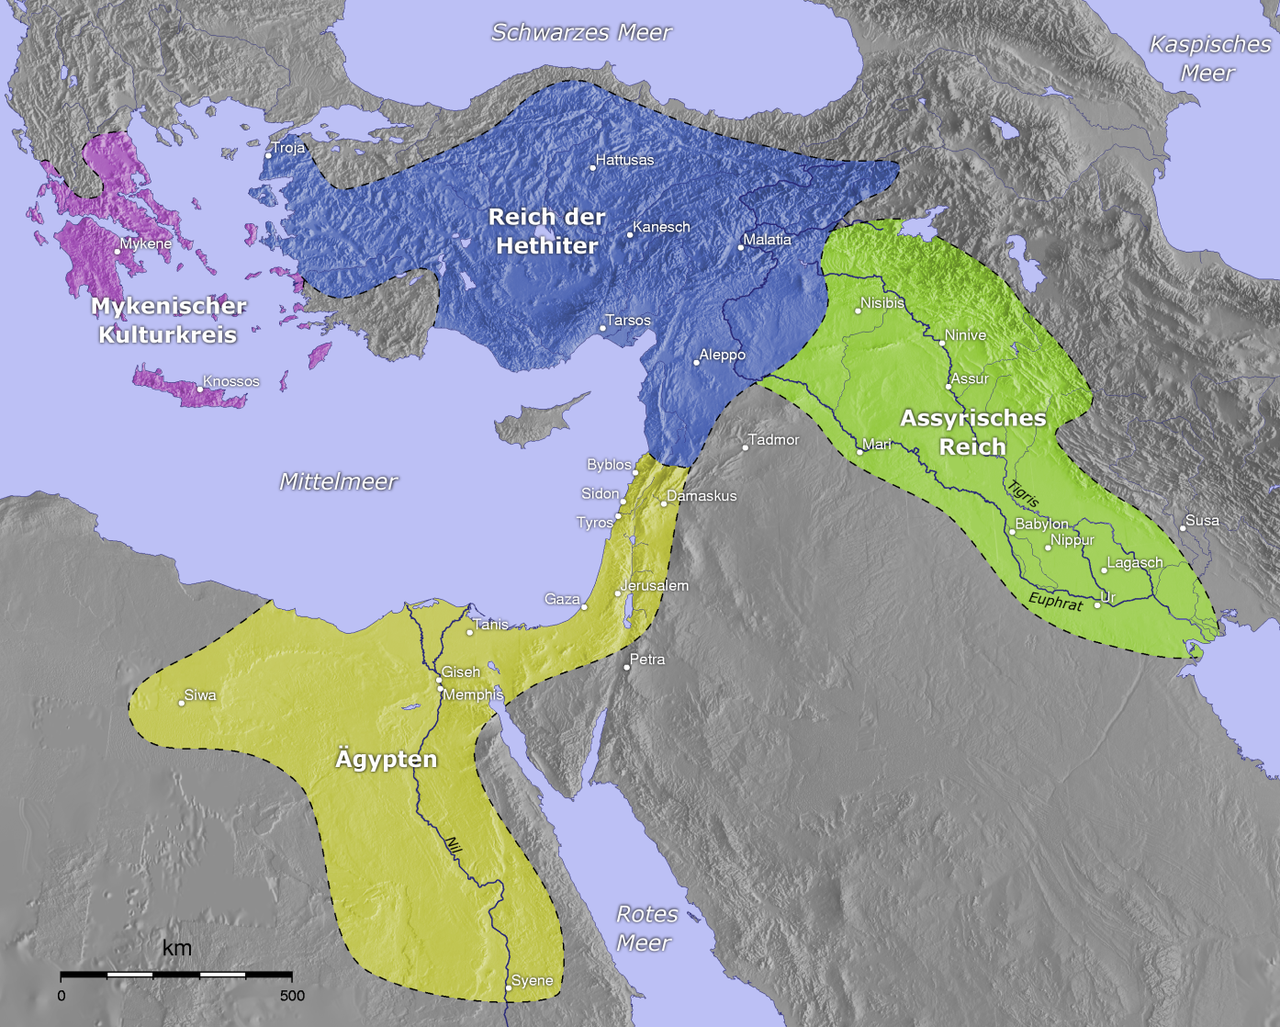 Map showing mycenaeans hittites assyrians and egypt